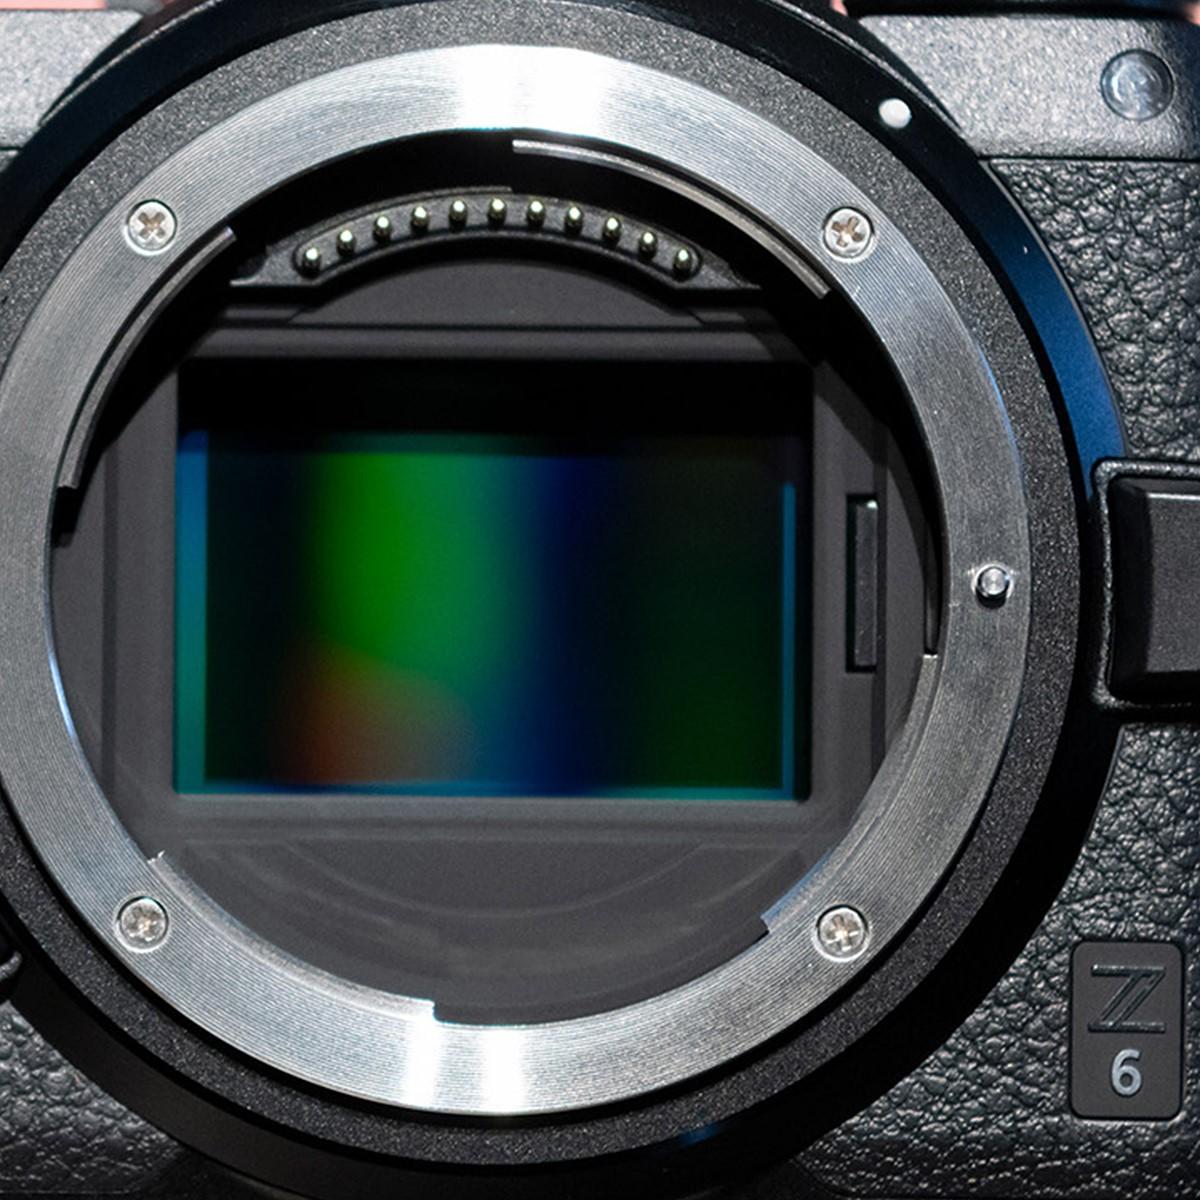 Nikon Z6 image quality and dynamic range impress, but not without